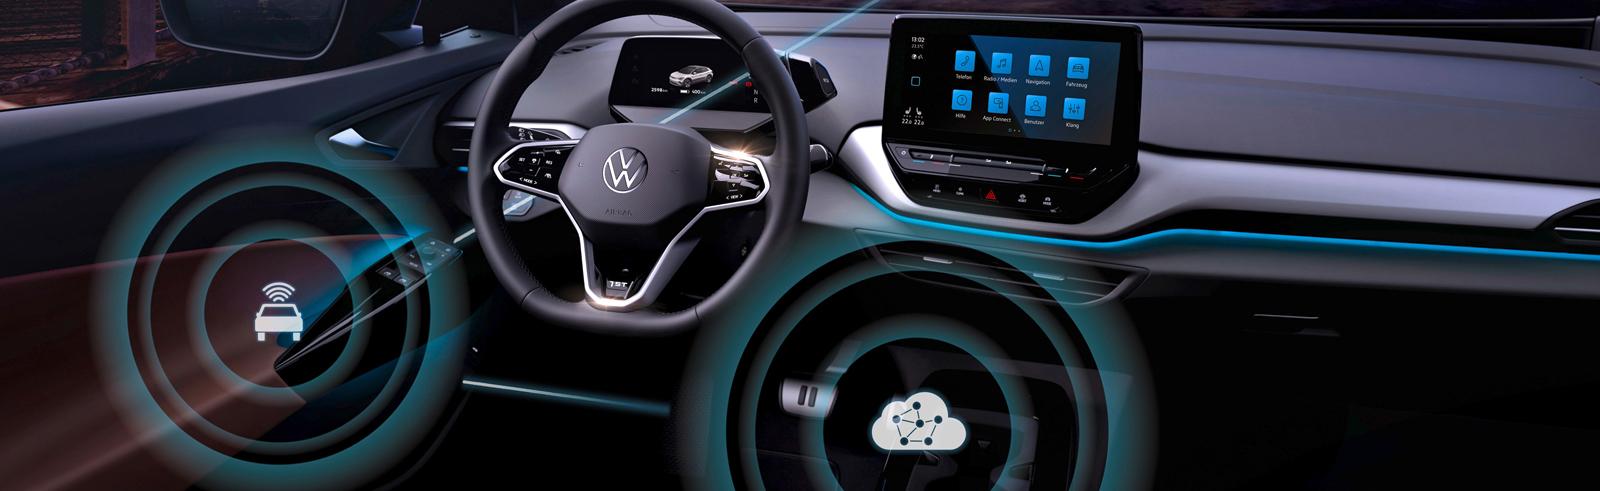 Volkswagen launches a regular OTA updates program for the ID family